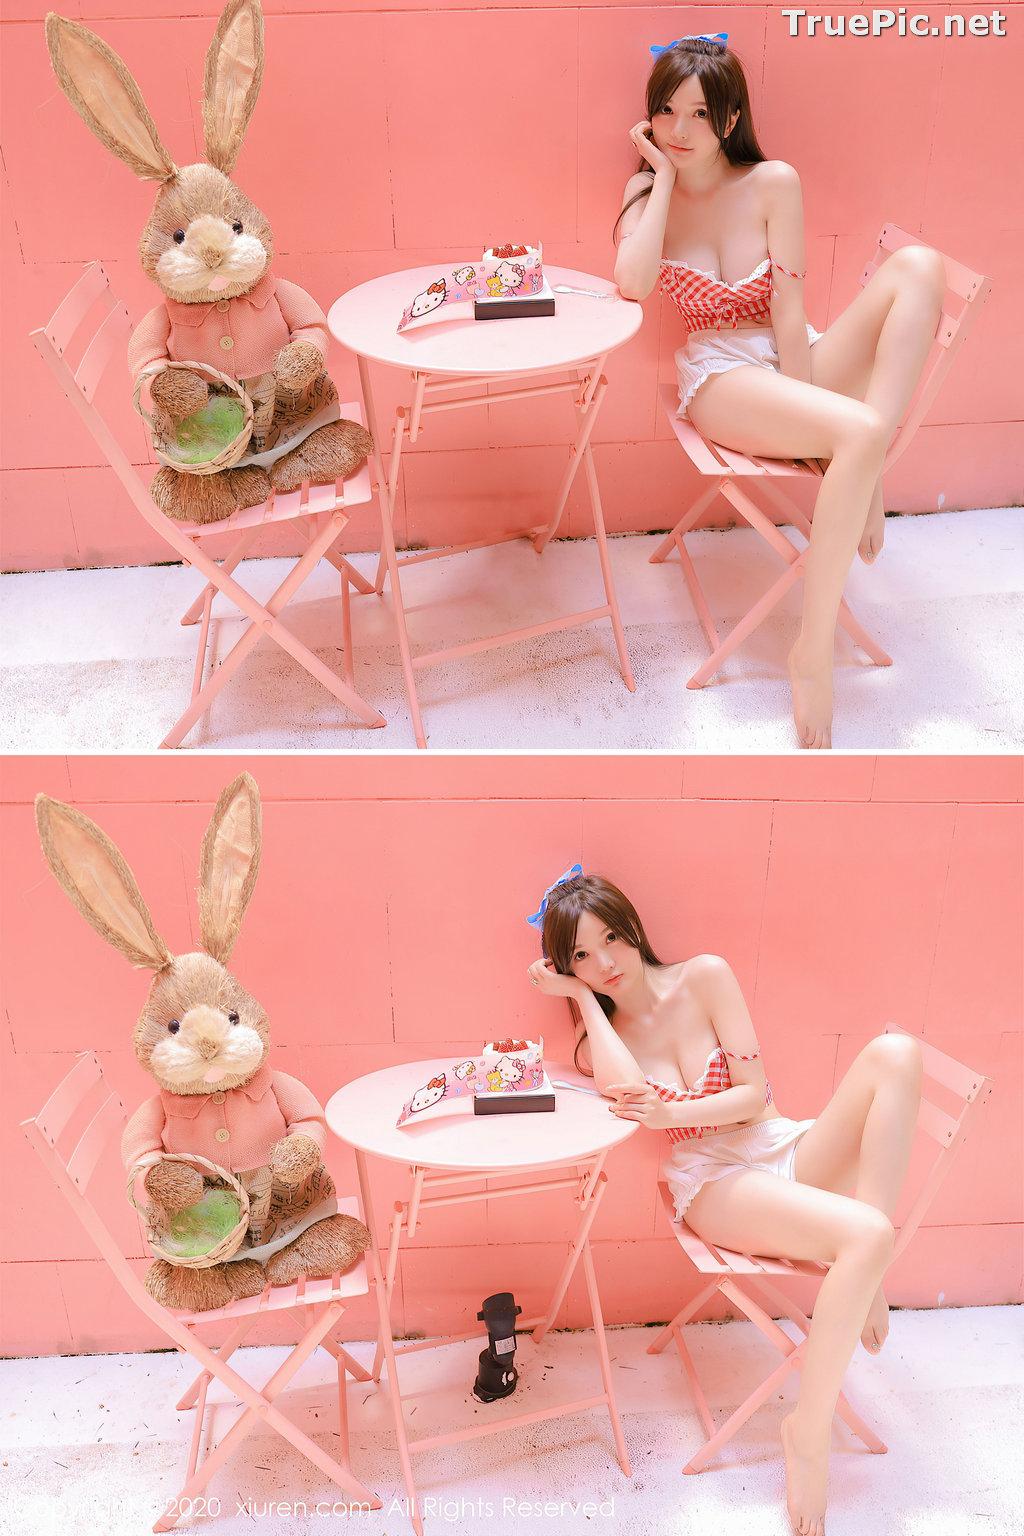 Image XIUREN No.2517 - Chinese Cute and Sexy Model - 糯美子Mini - TruePic.net - Picture-7